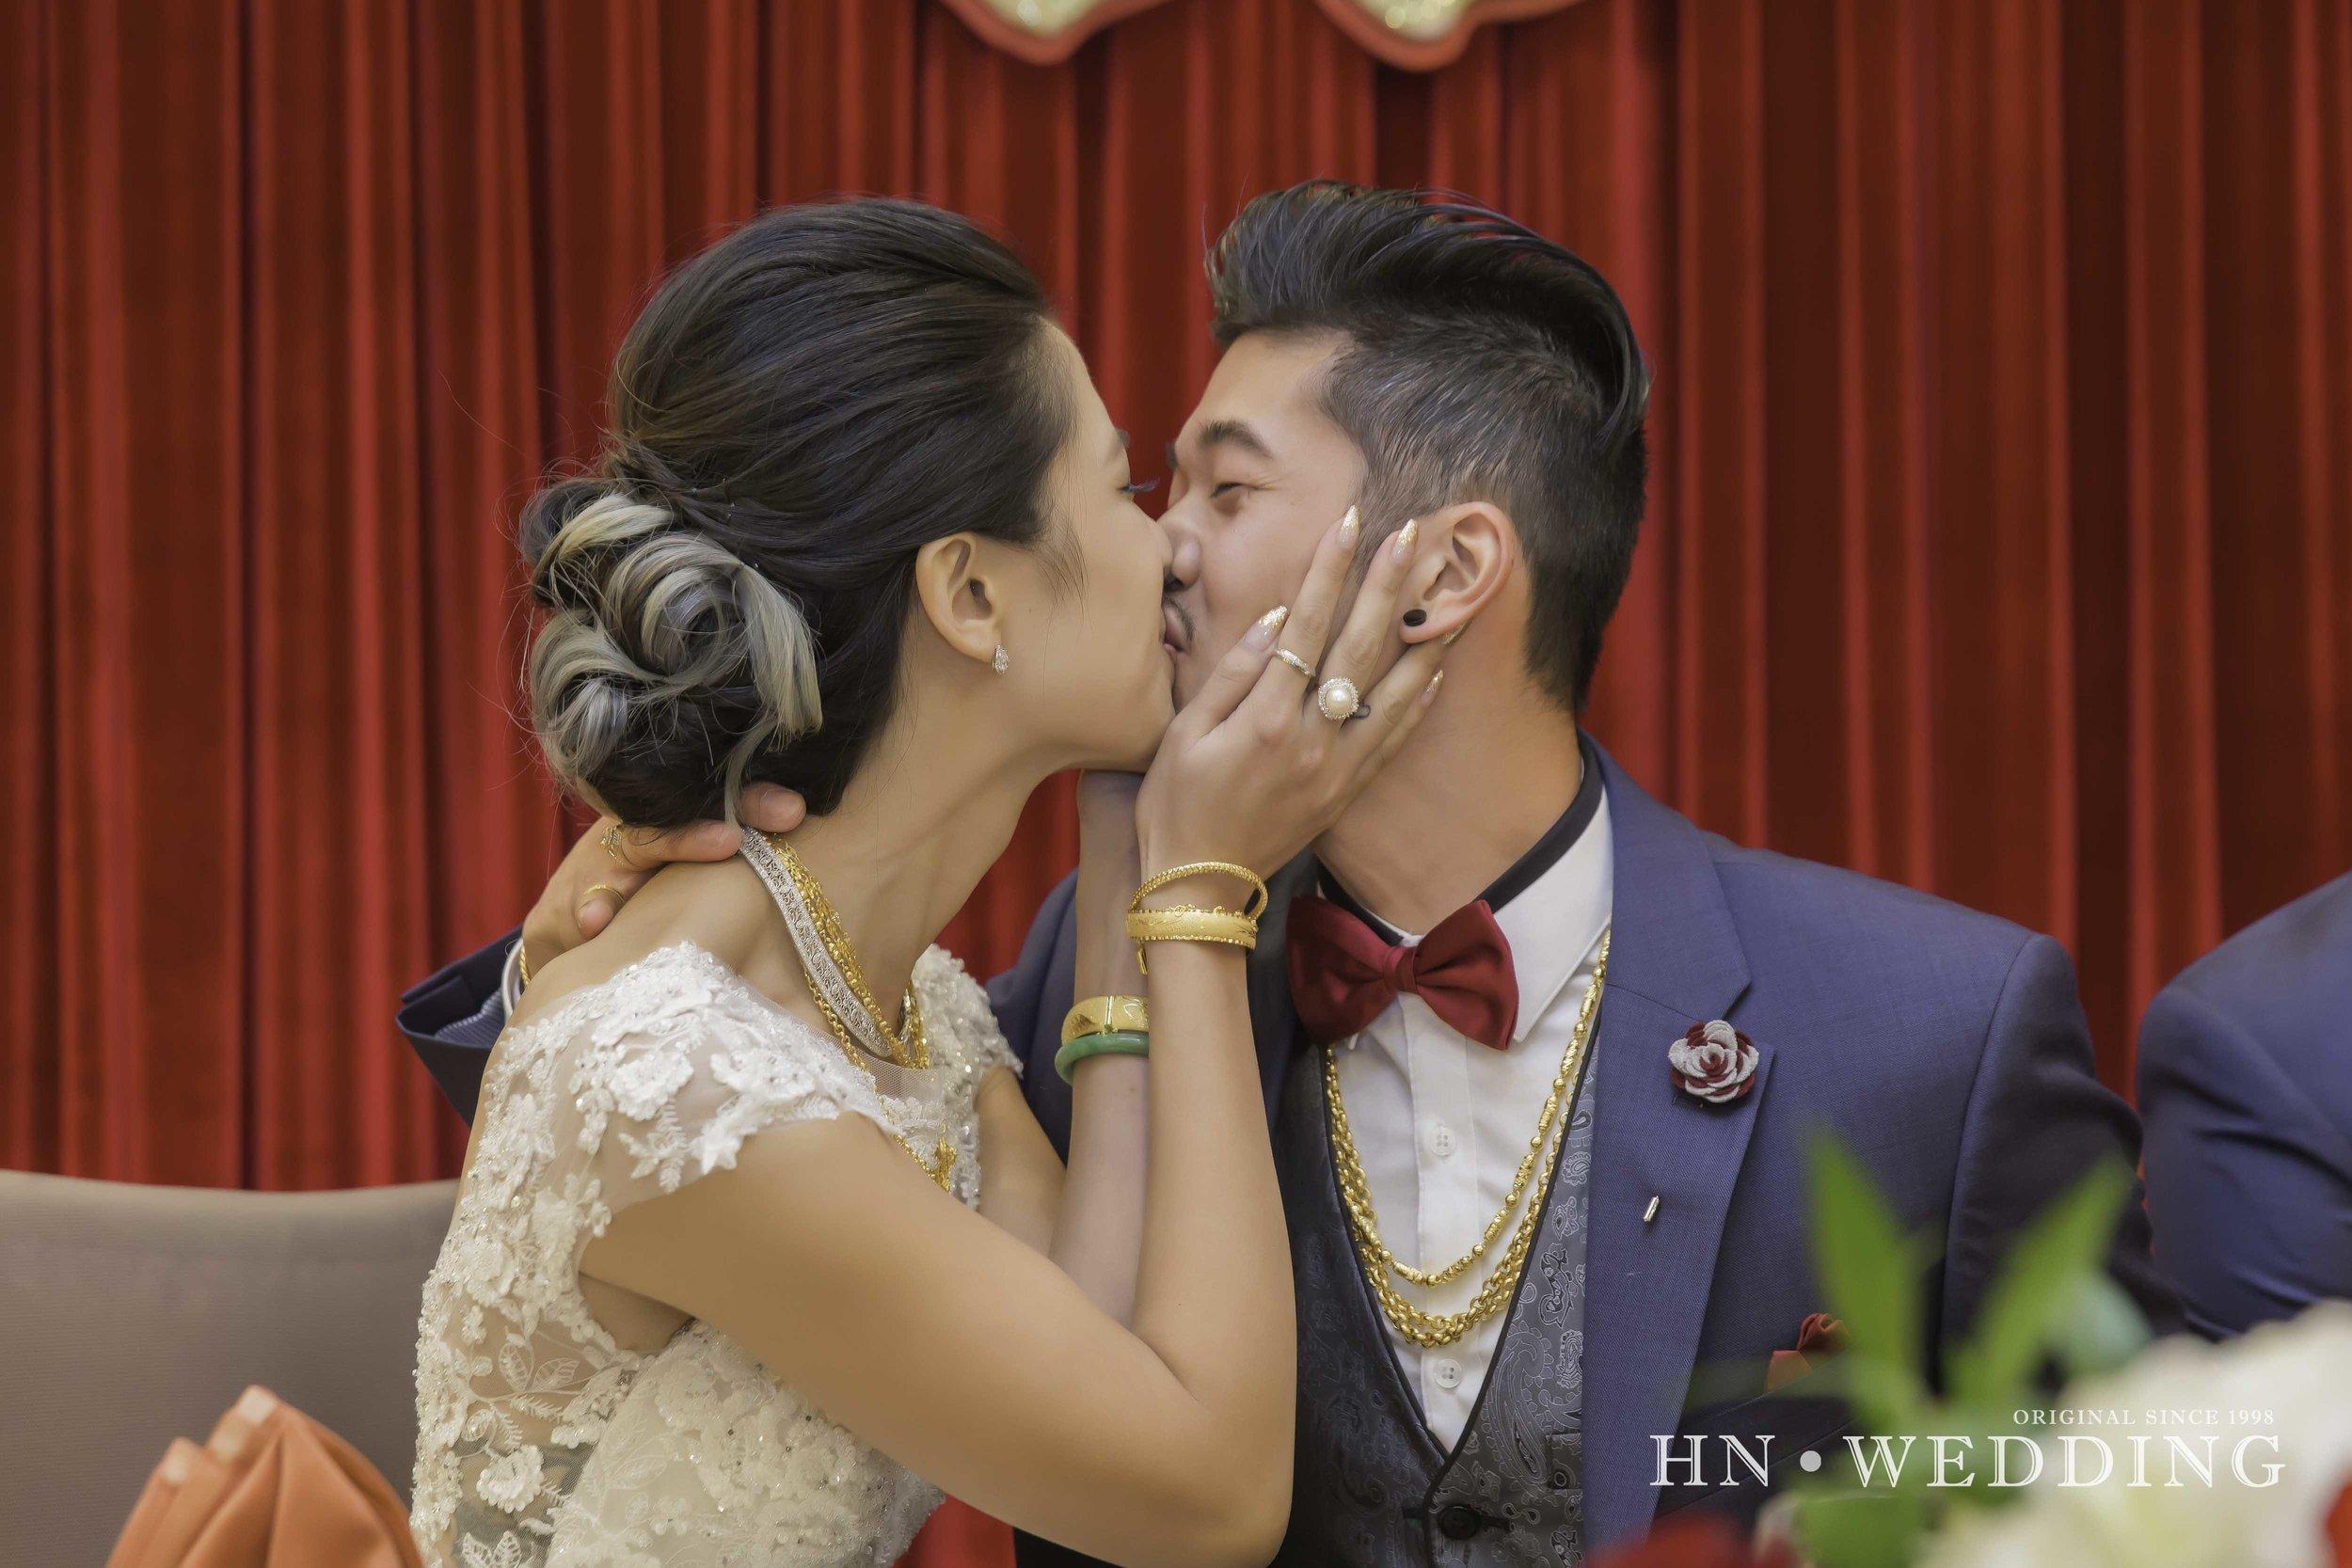 HNwedding-20160815-wedding-041.jpg